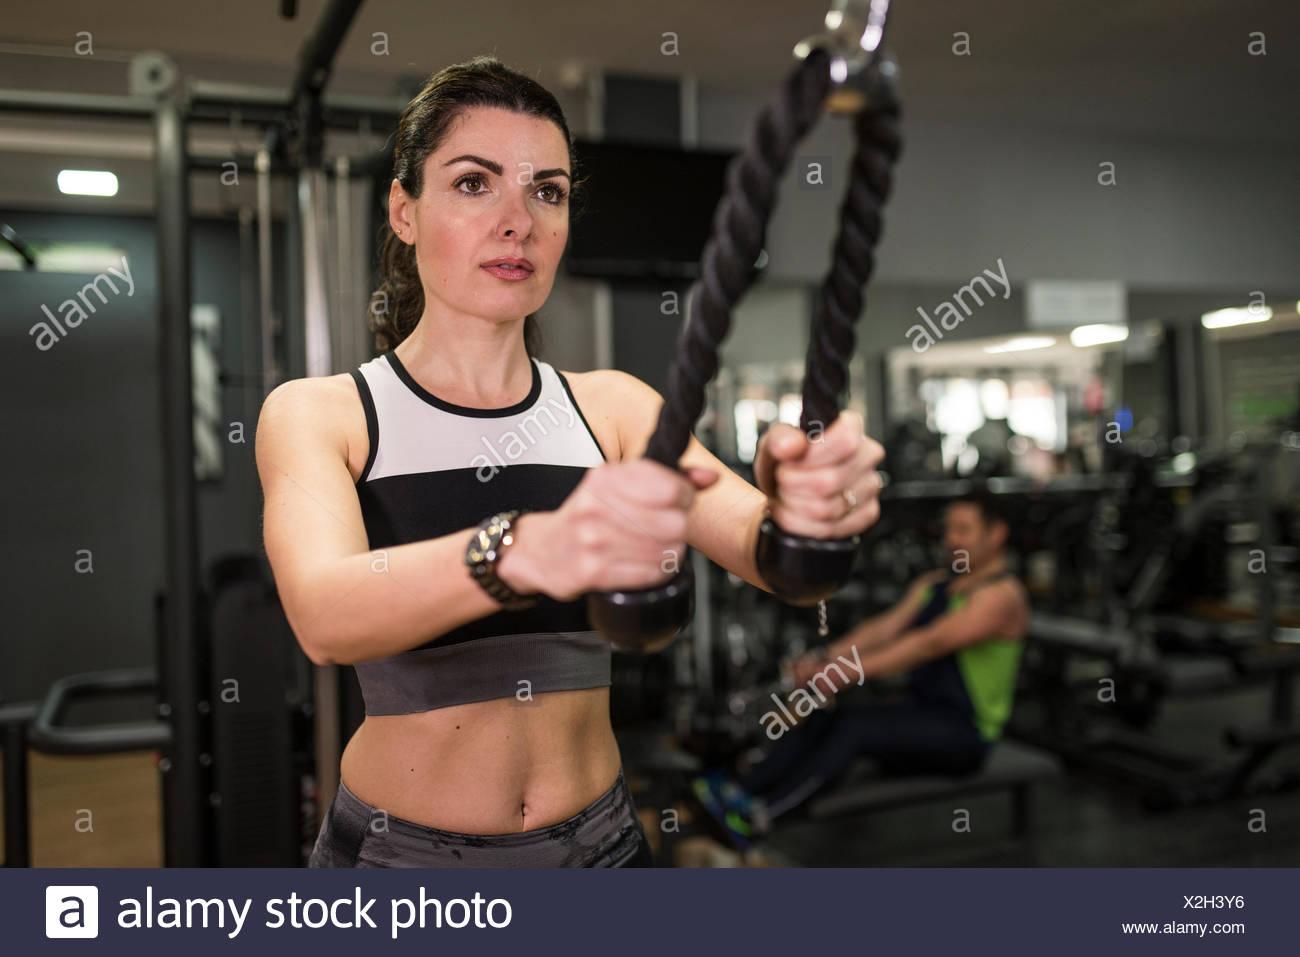 Triceps Muscle Imágenes De Stock & Triceps Muscle Fotos De Stock - Alamy